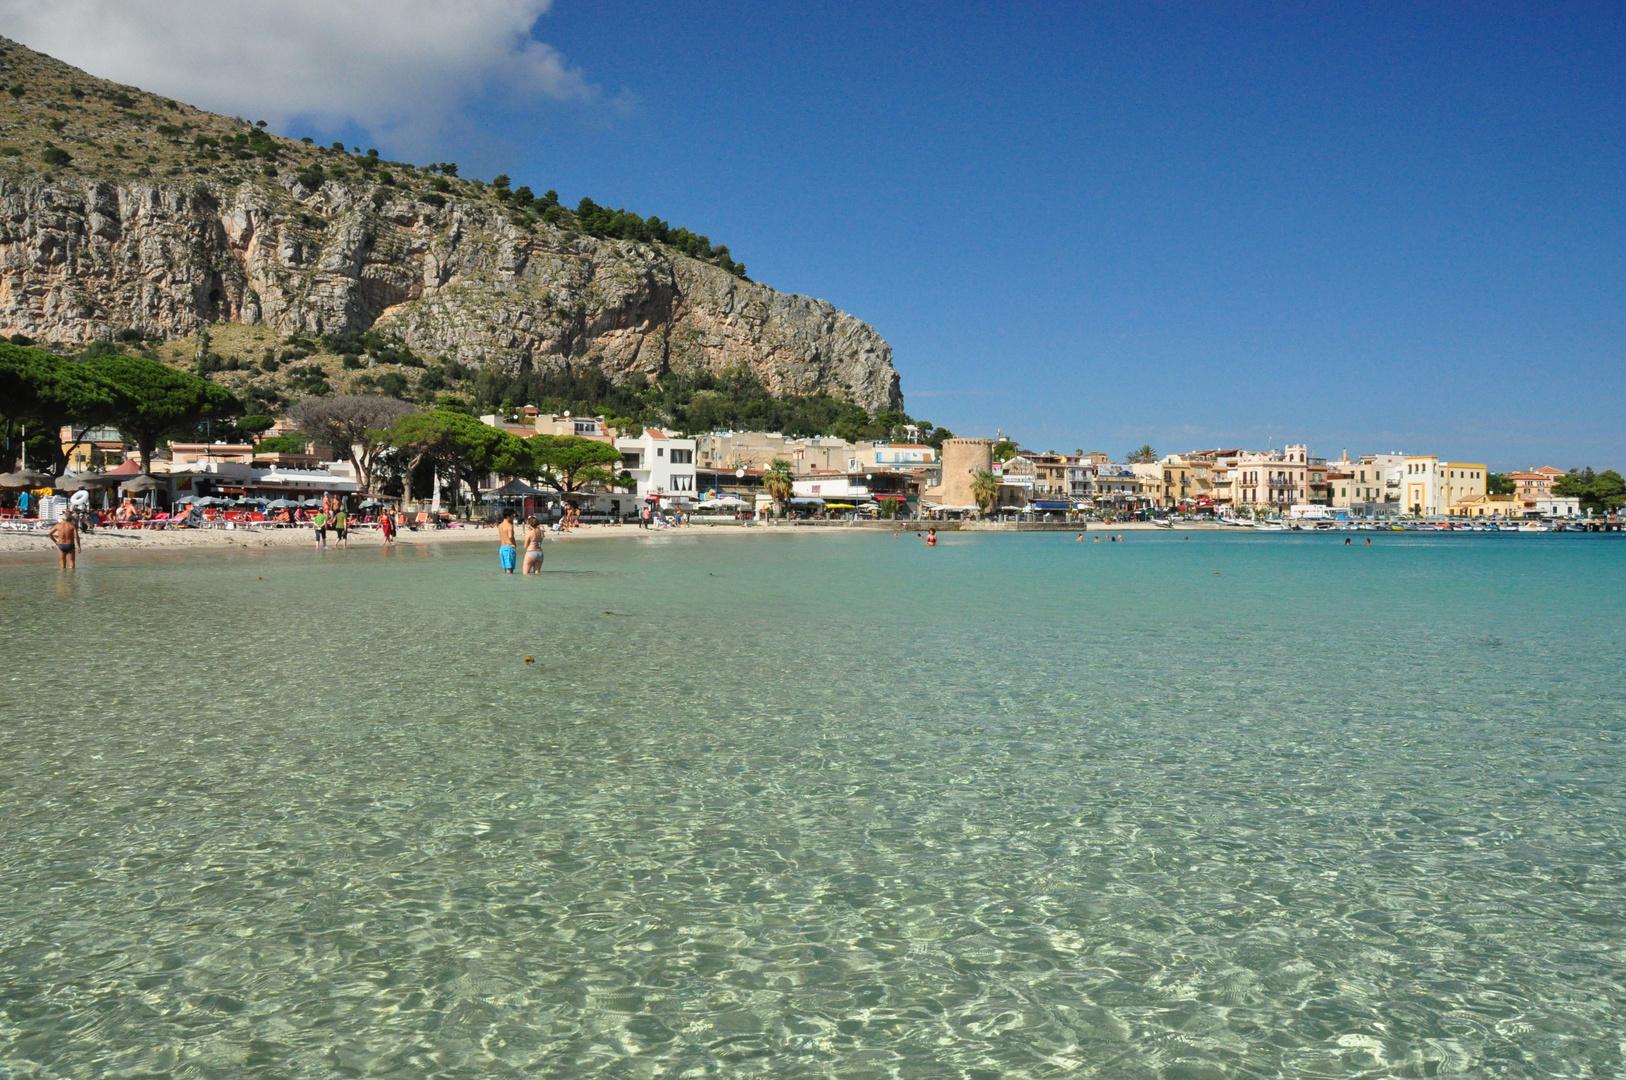 Sizilien - Mondello Beach